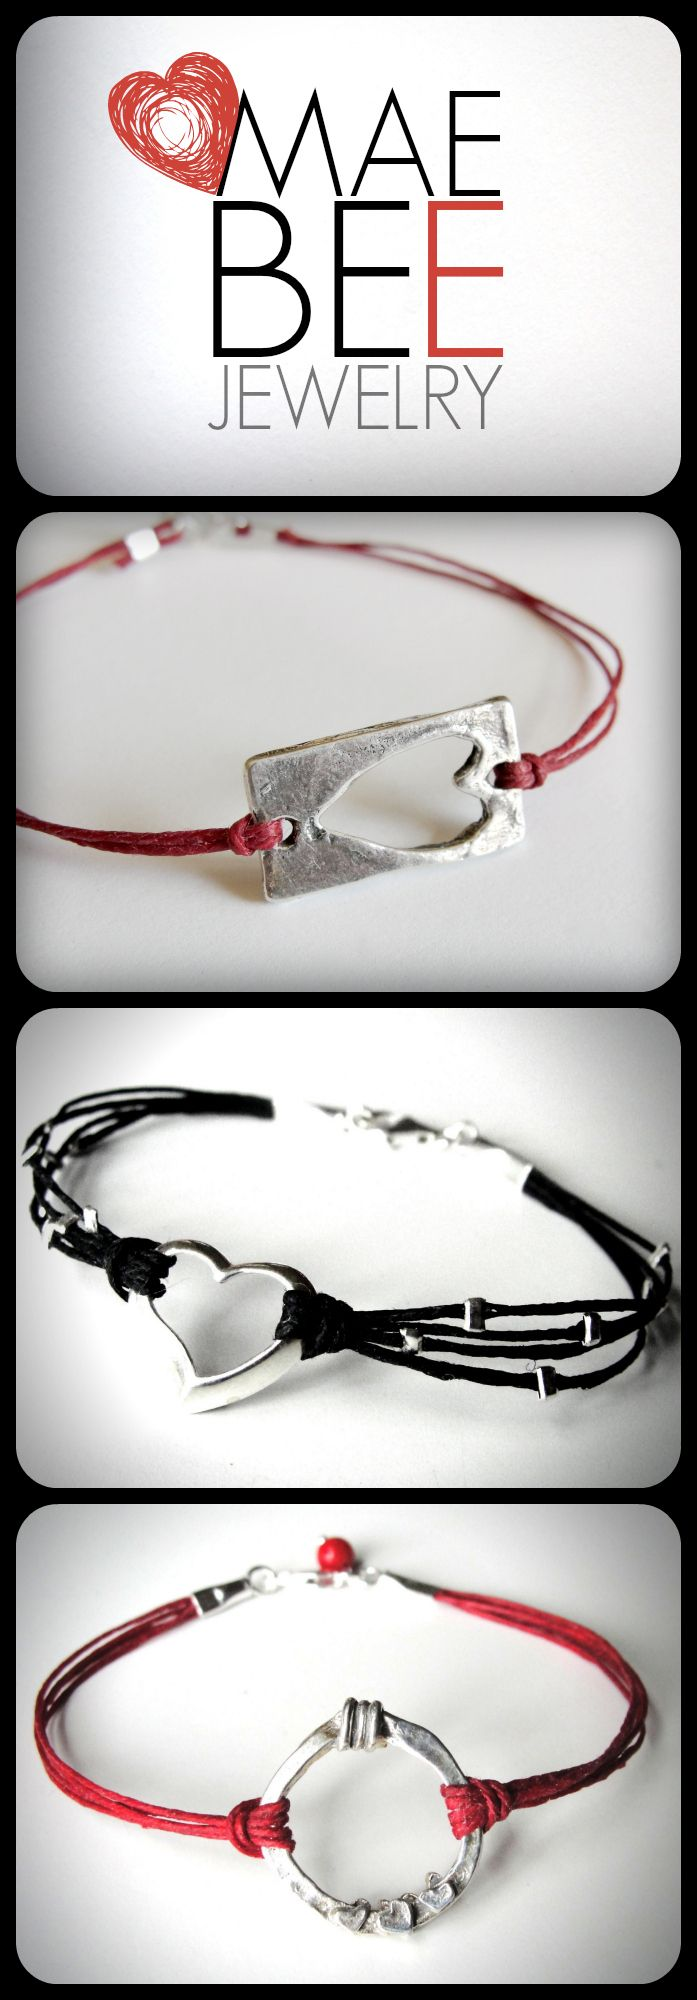 Sterling #heart & red linen #bracelets for your #Valentine! ...from JewelryByMaeBee on #Etsy. www.jewelrybymaebee.etsy.com